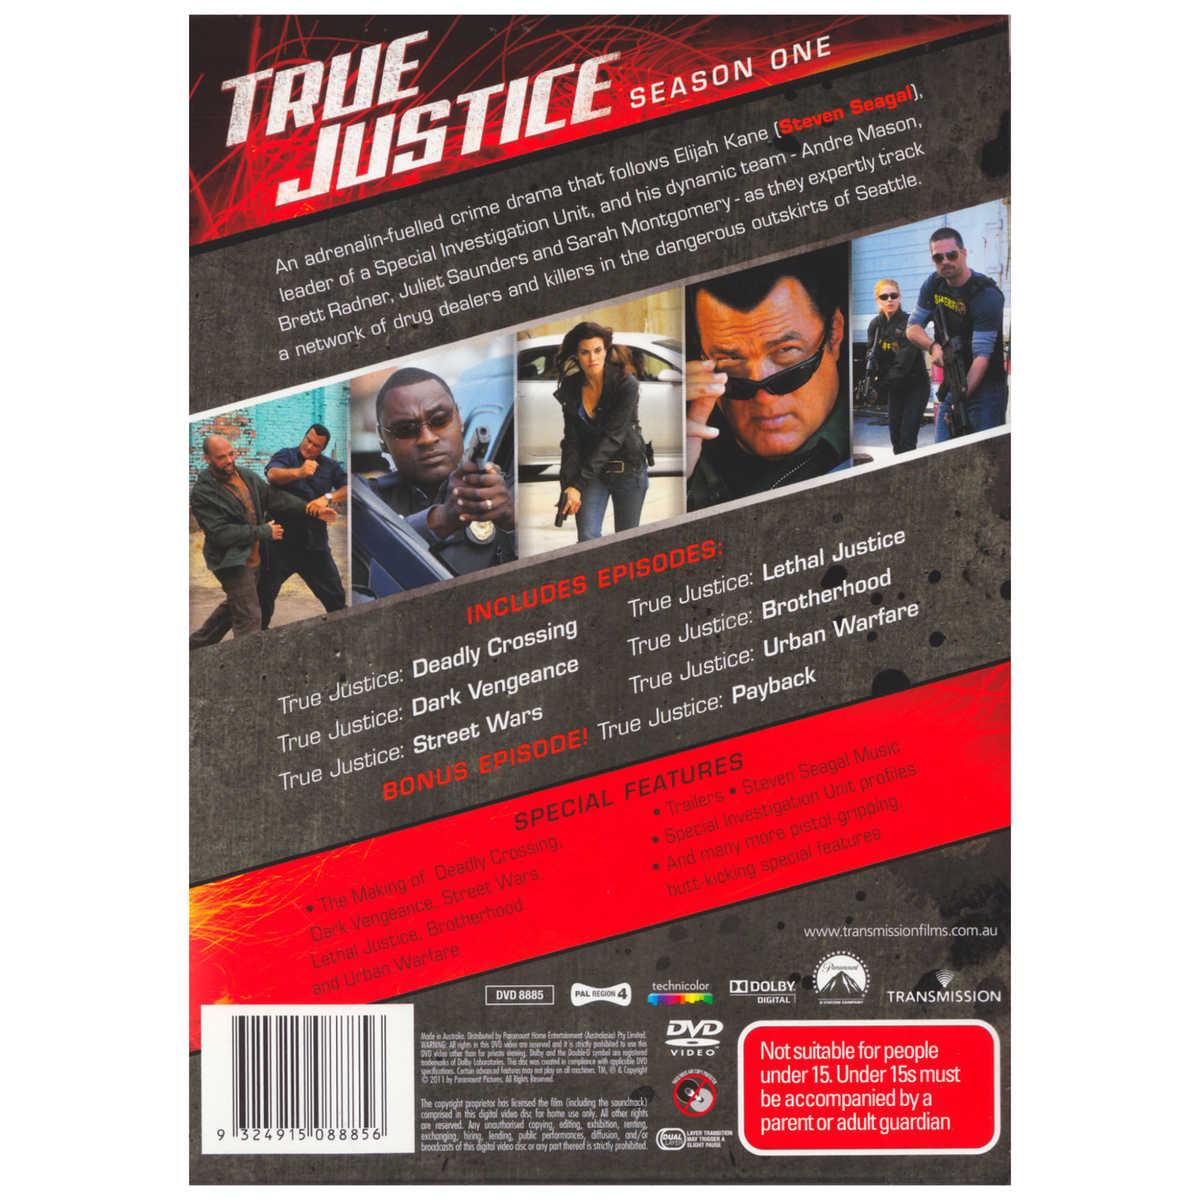 High Resolution Wallpaper | True Justice: Street Wars 1200x1200 px